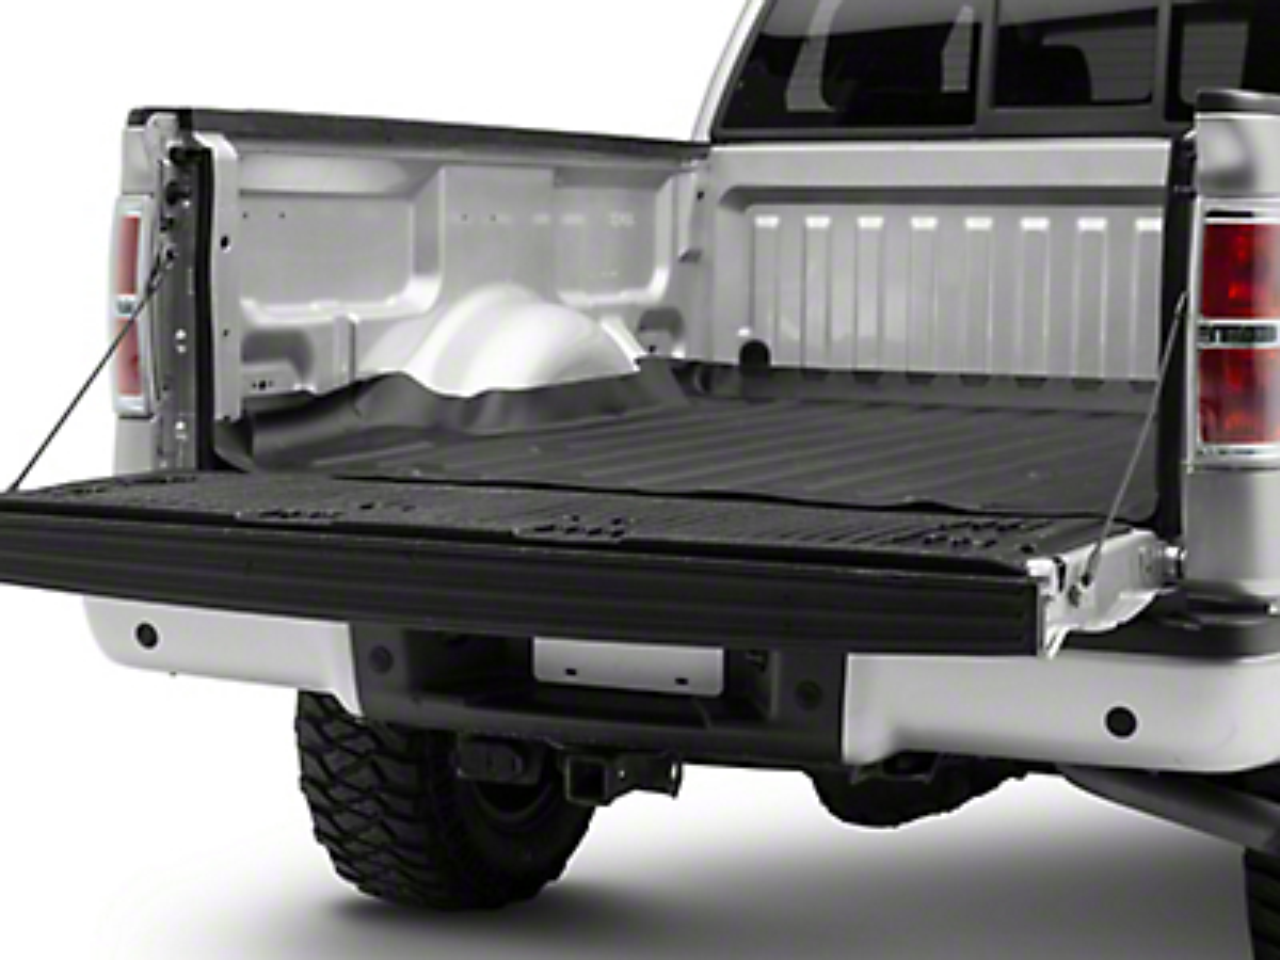 Weathertech TechLiner Bed Mat - Black (04-14 F-150 Styleside)